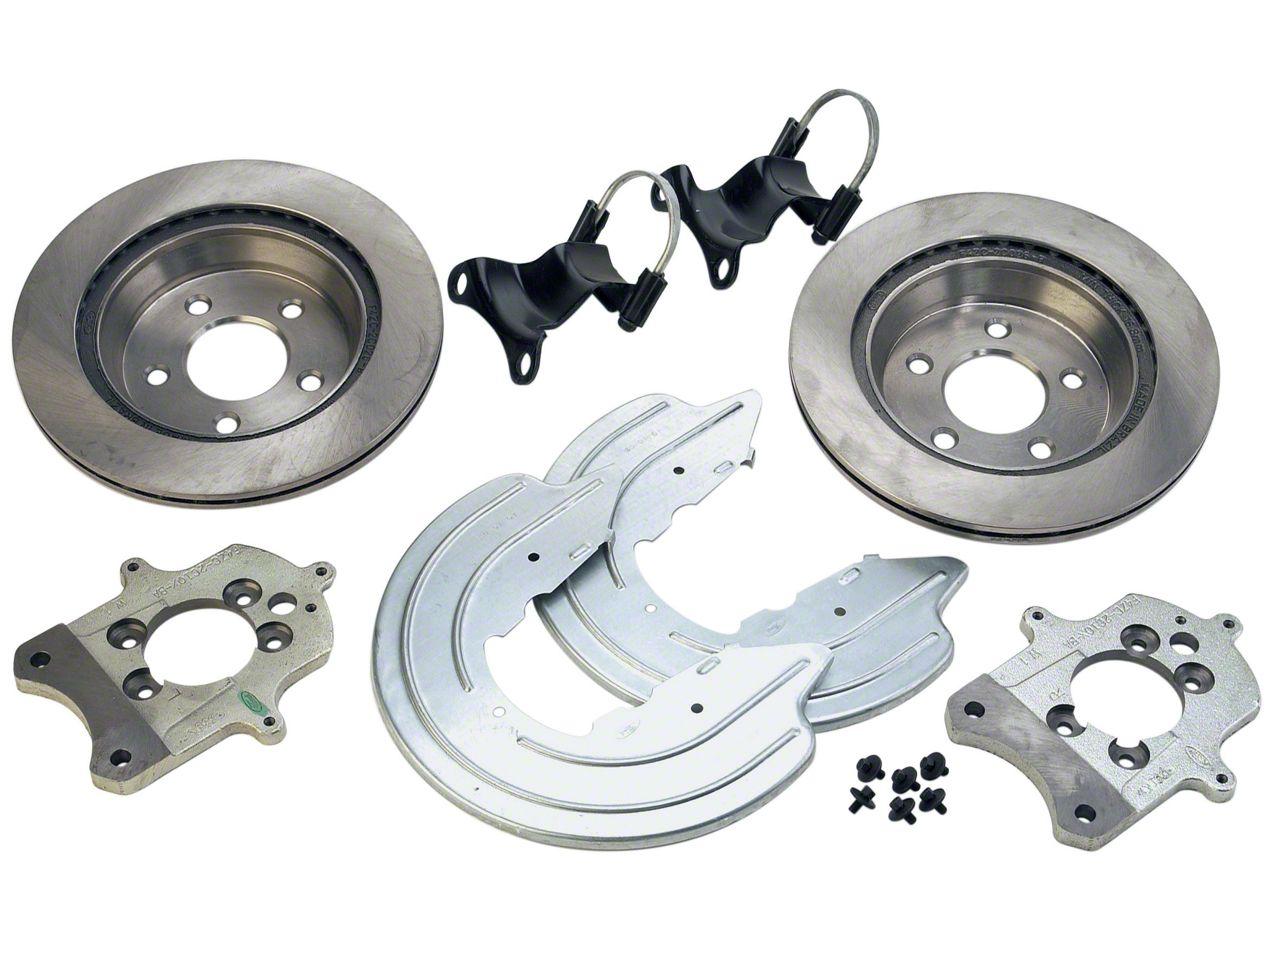 Ford Performance Rear Caliper Bracket Kit with Rotors (94-04 GT, V6)